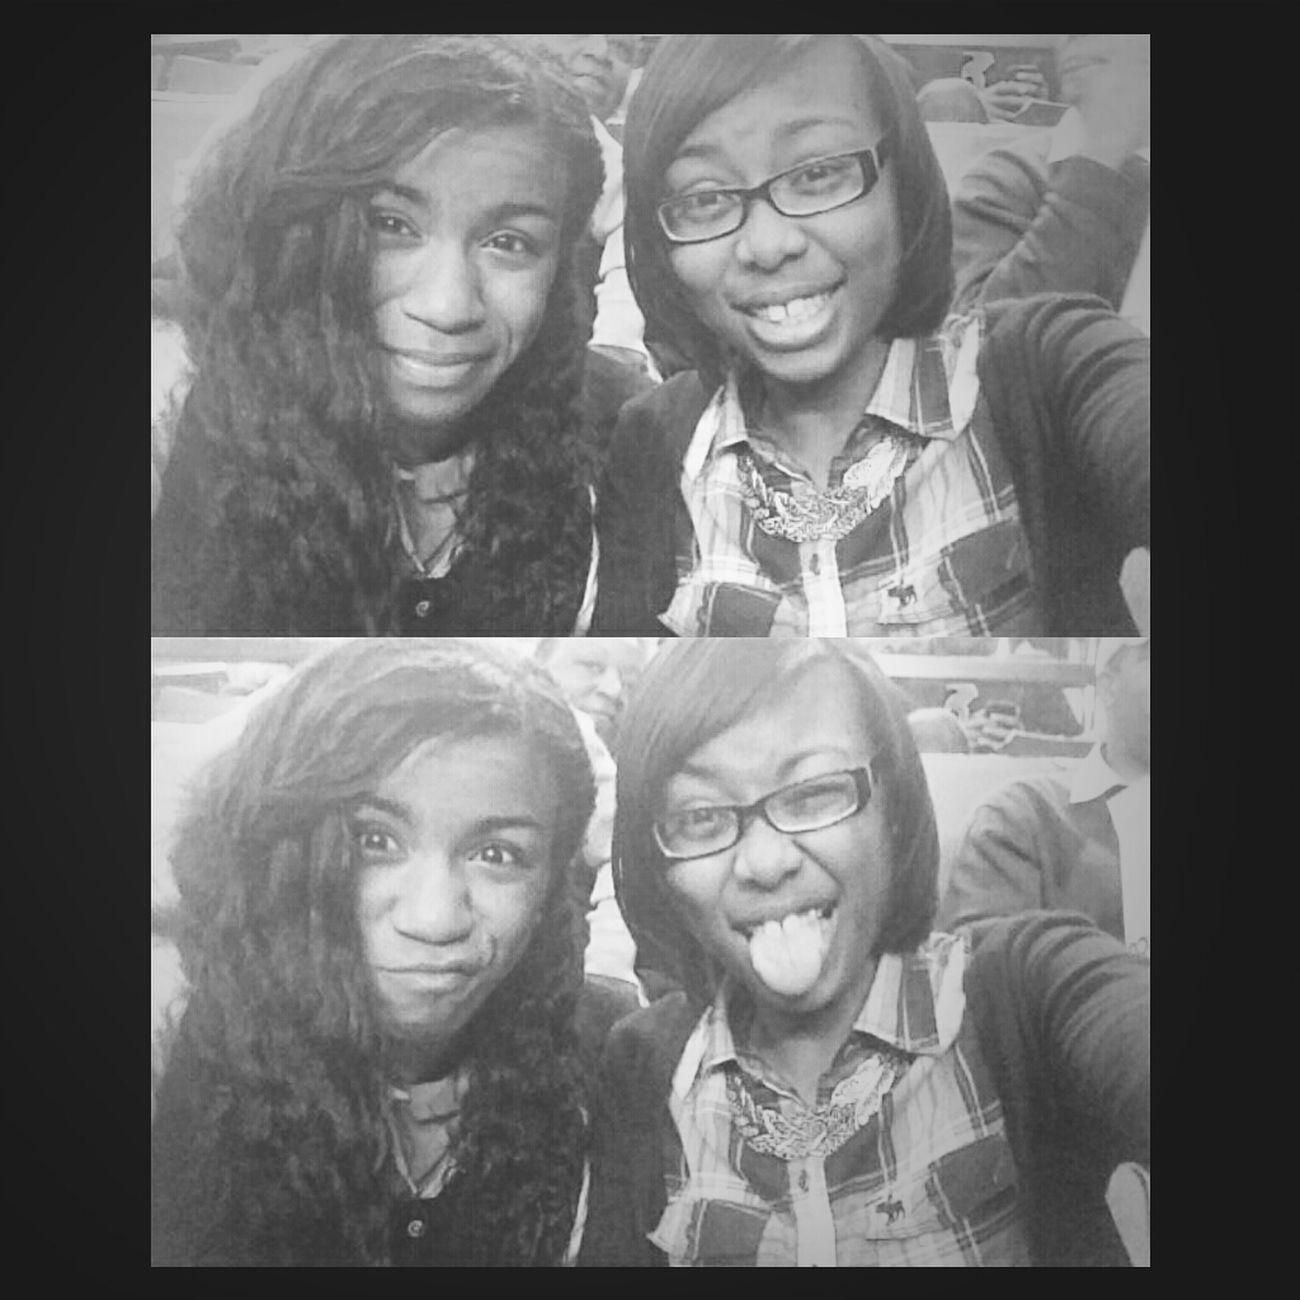 With Briana